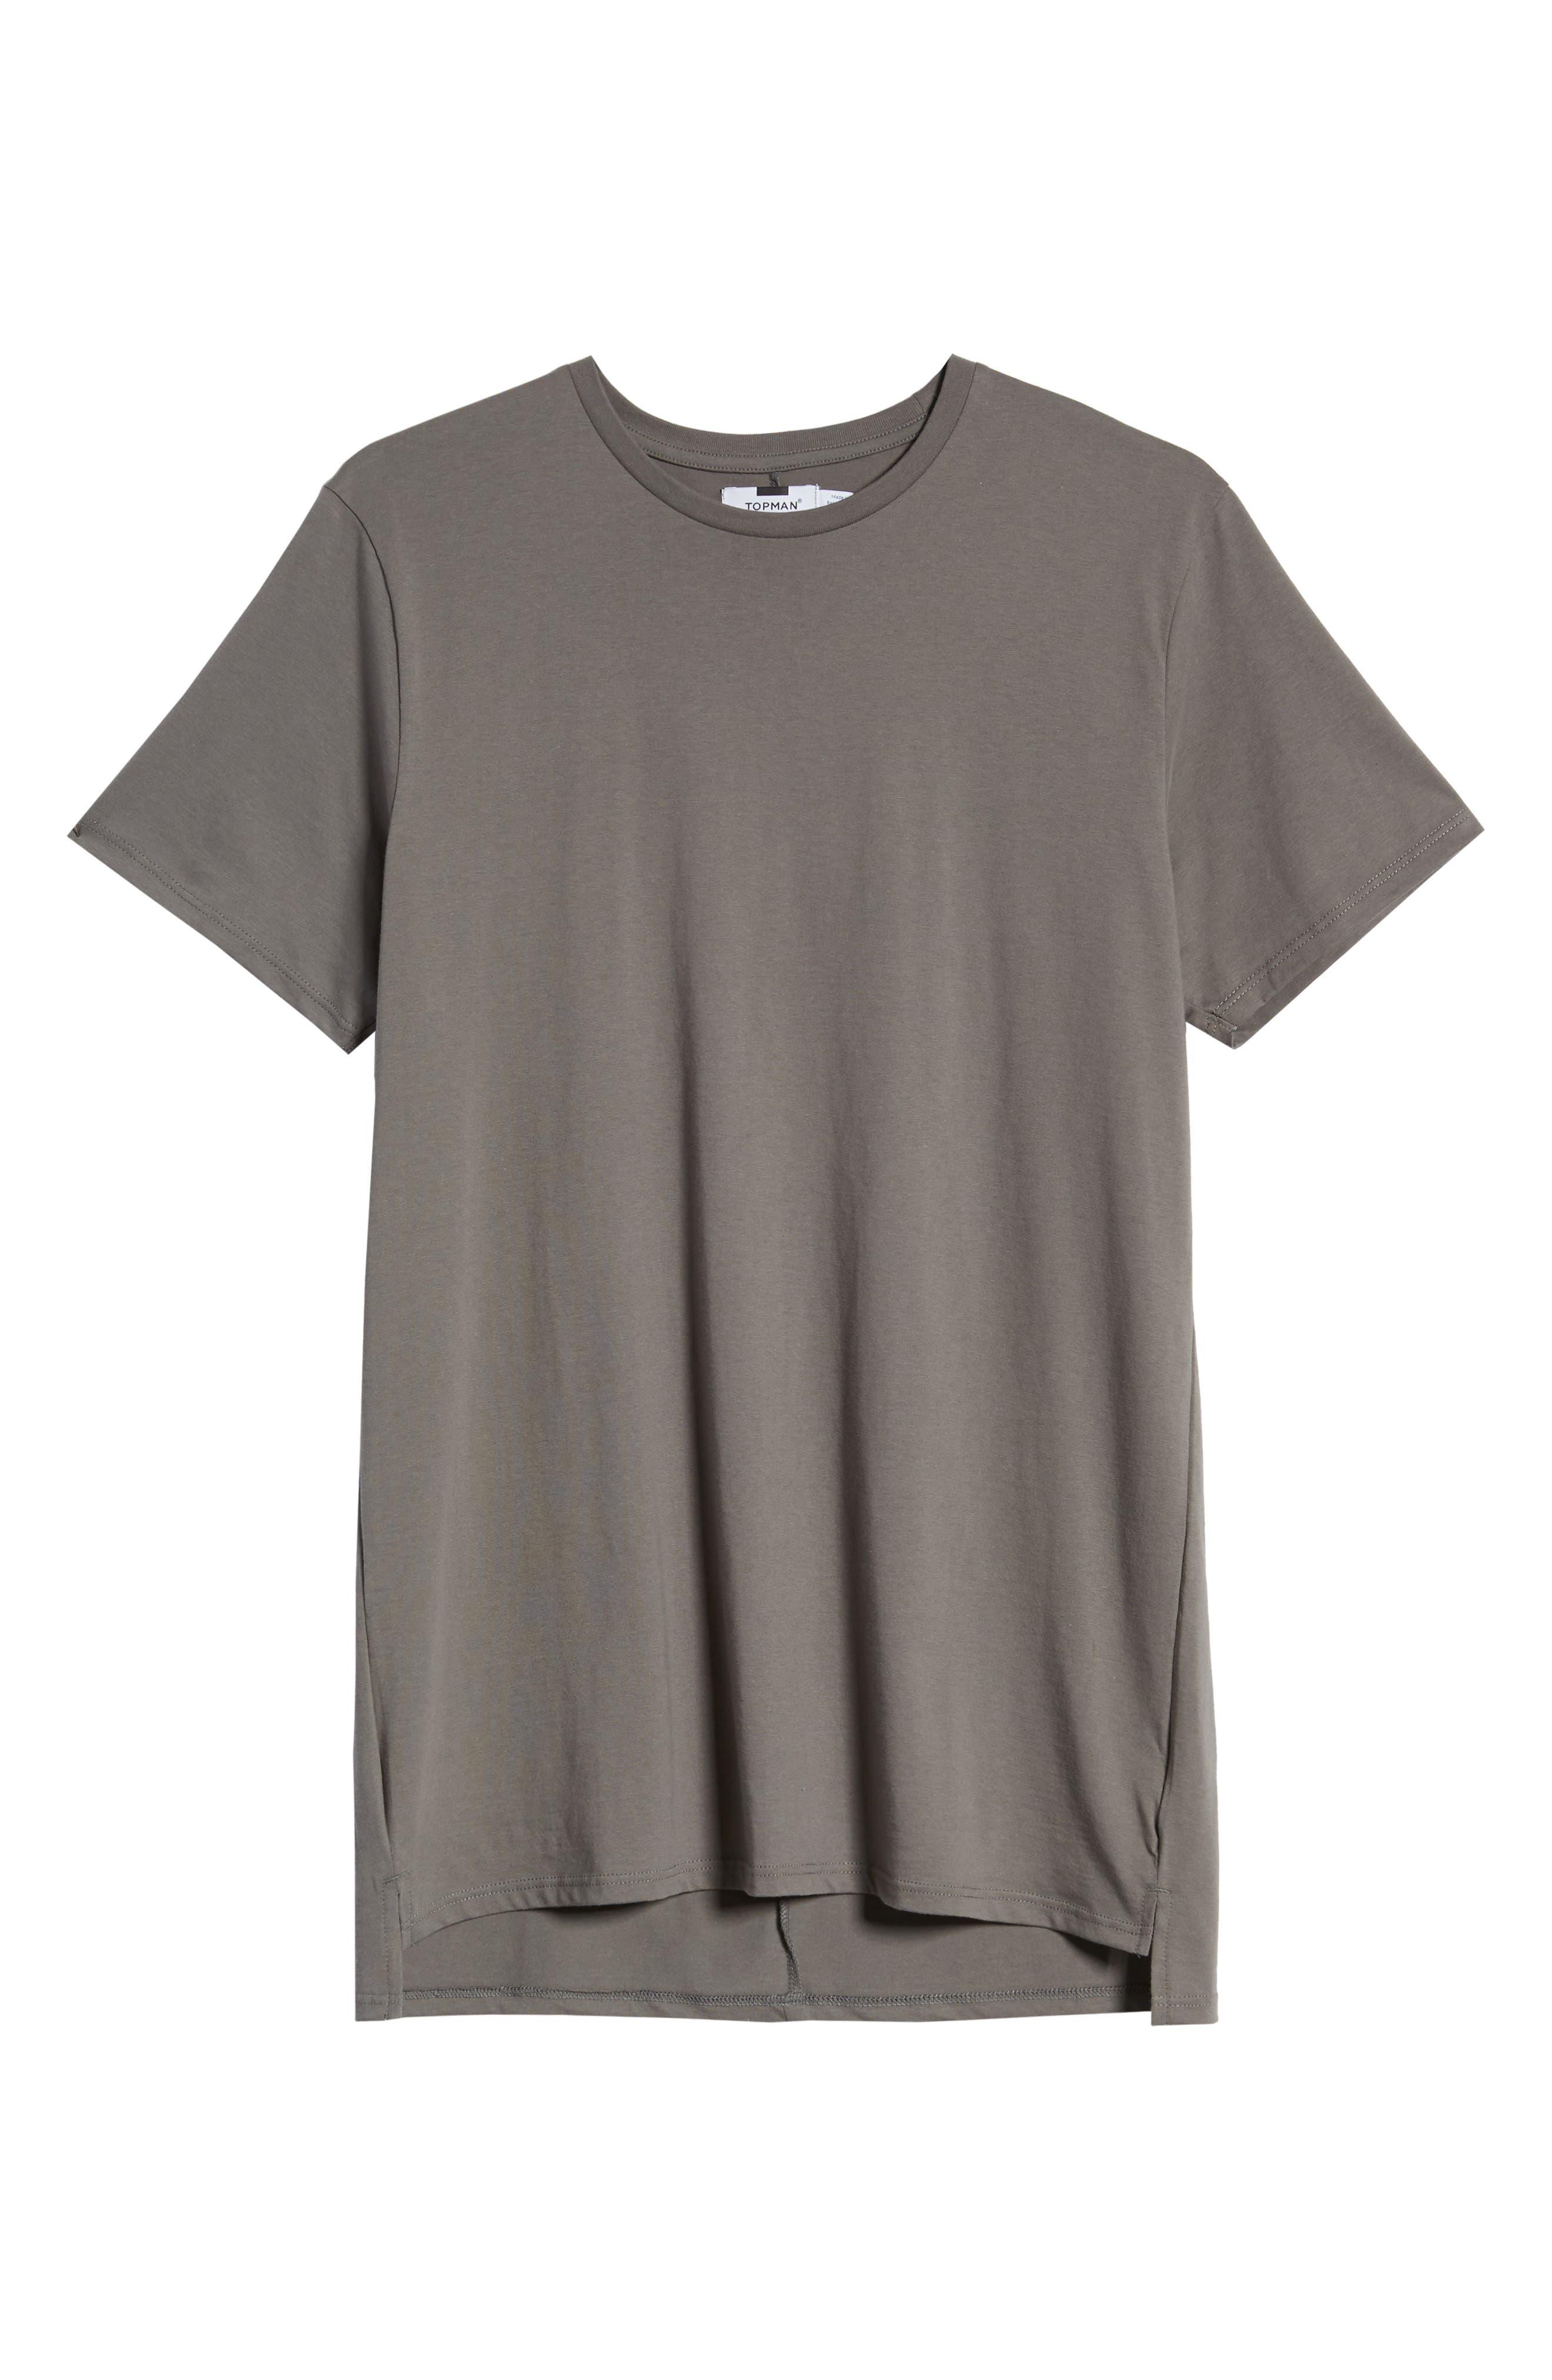 TOPMAN, Longline T-Shirt, Alternate thumbnail 6, color, GREY